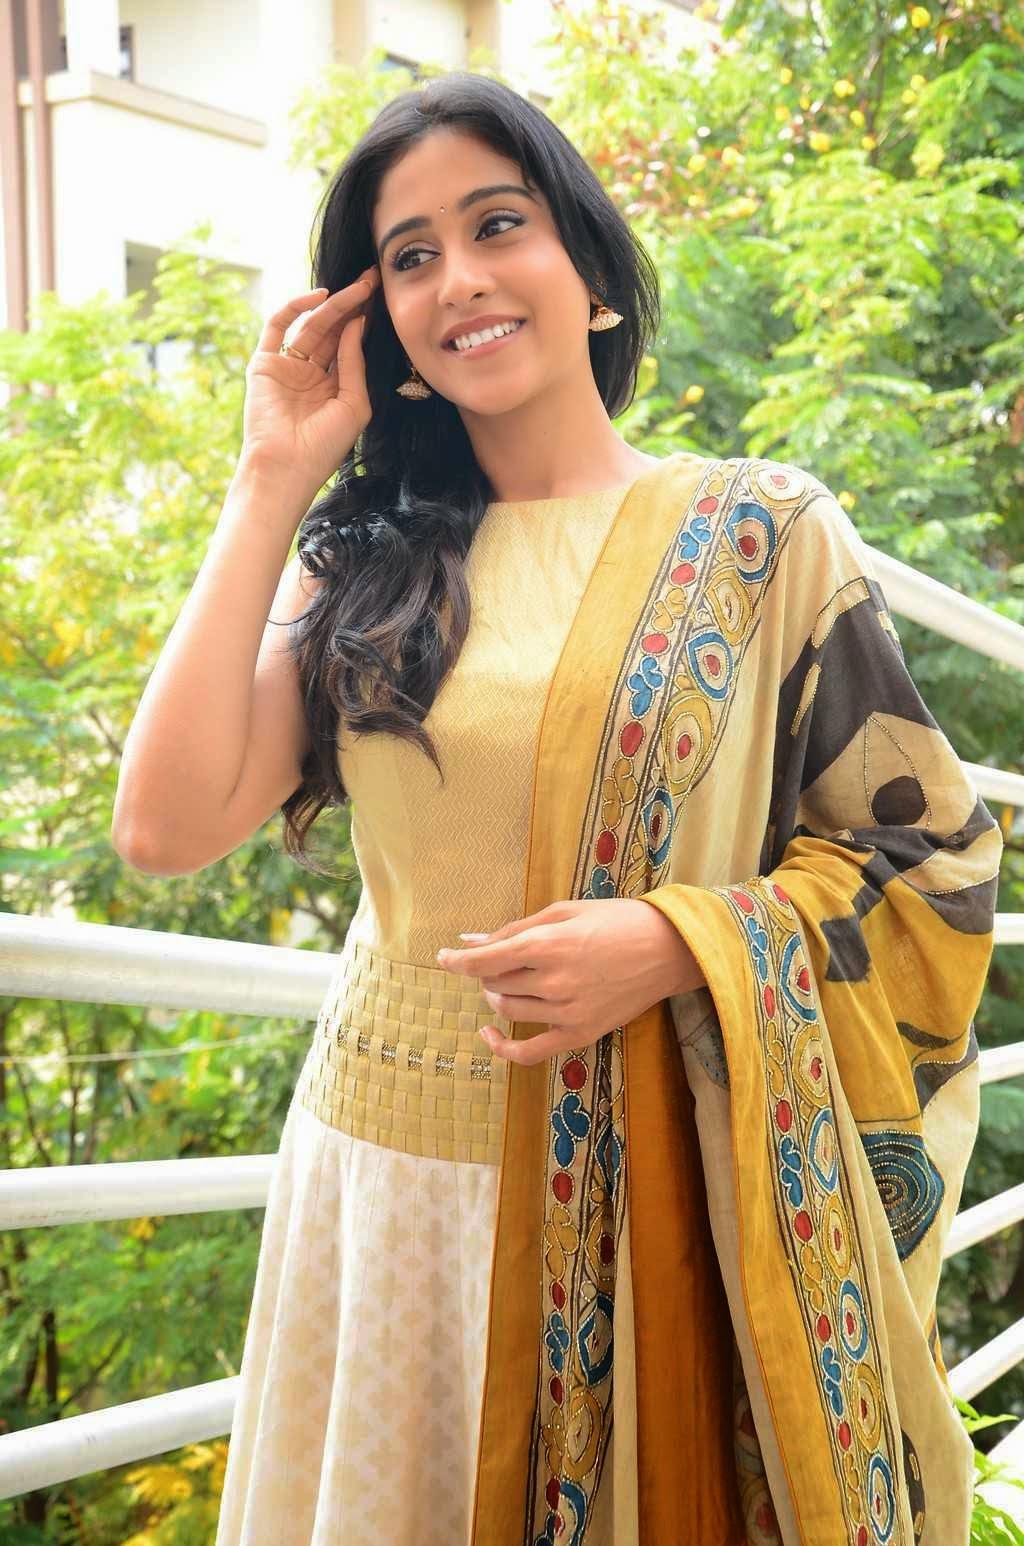 Actress Regina Cassandra Latest Cute Hot Exclusive Beautiful Yellow Dress Spicy Photos Gallery At Subramanyam For Sale Telugu Movie Press Meet (25)